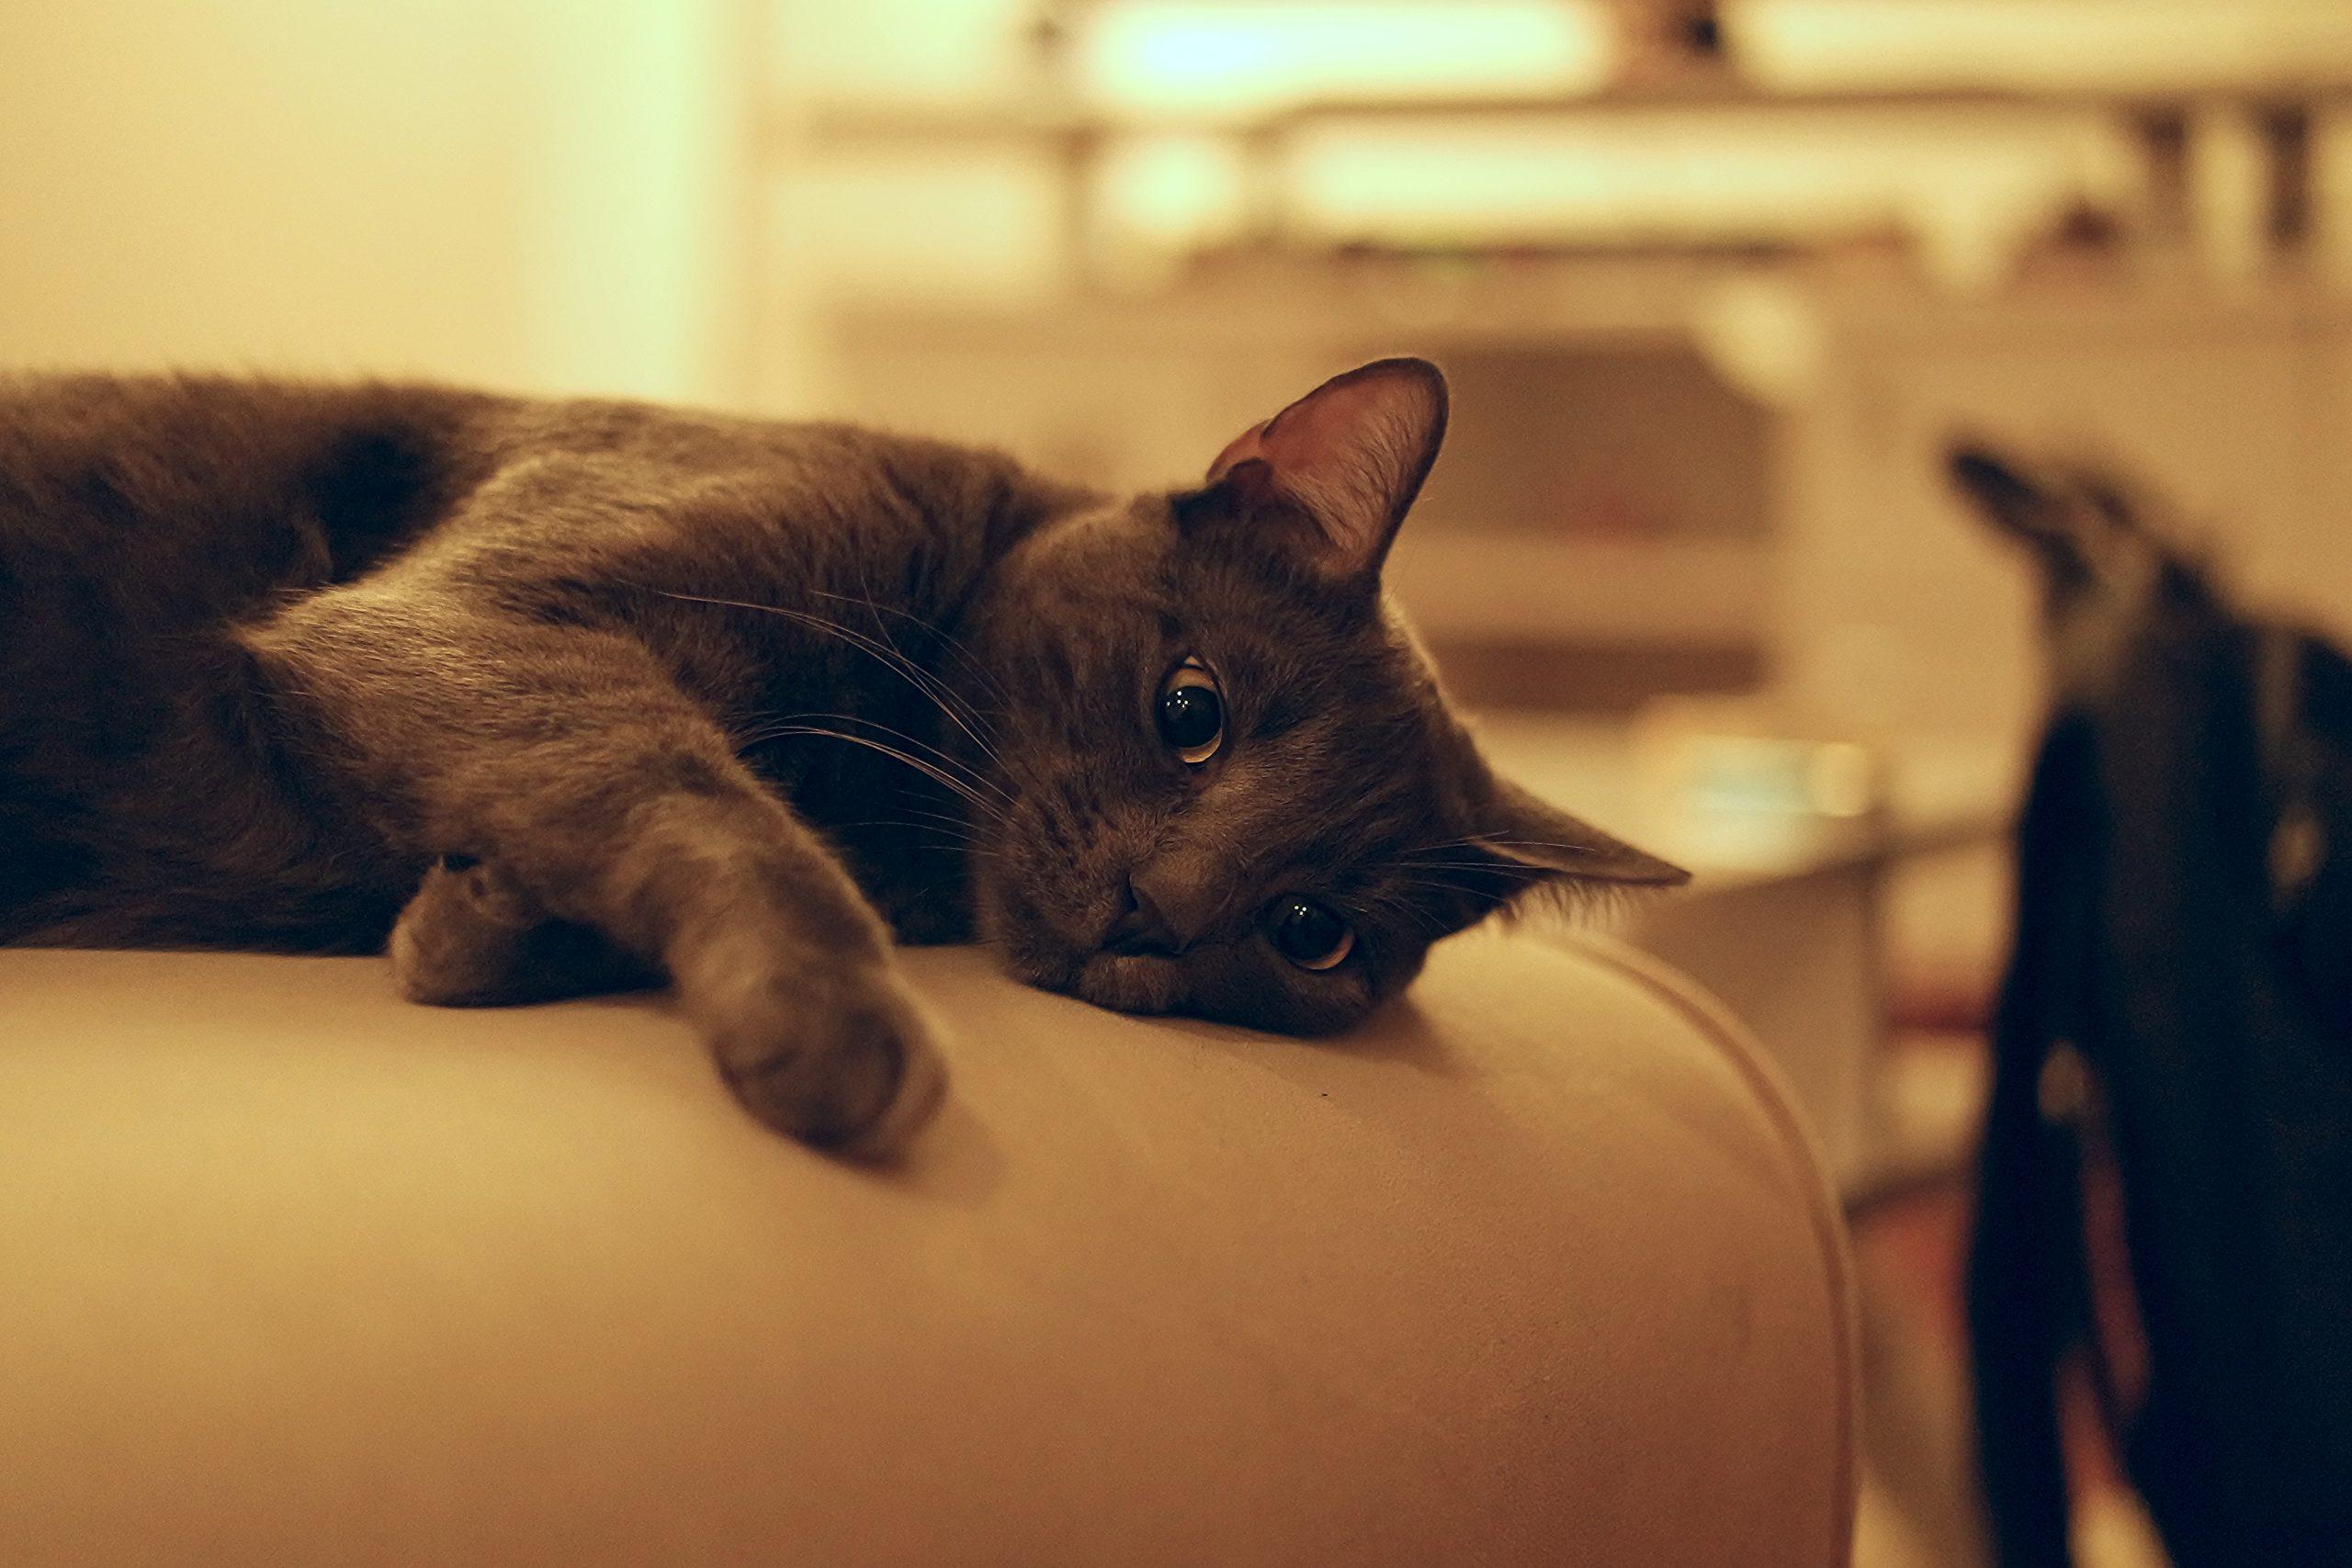 spaying in kenosha, spay cat kenosha, spay dog kenosha